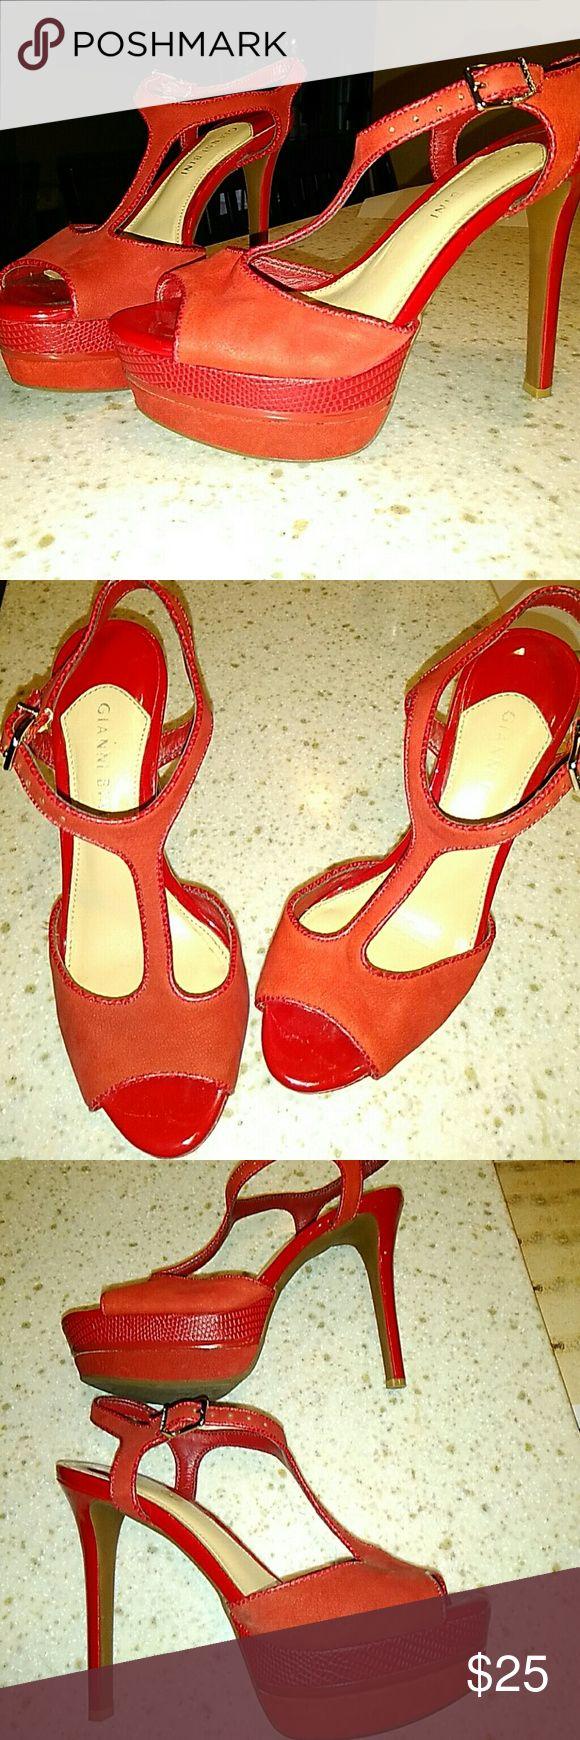 Red Gianni Bini high heels size 6.5 Beautiful red leather high heels from Gianni Bini. Size 6.5 Gianni Bini Shoes Heels